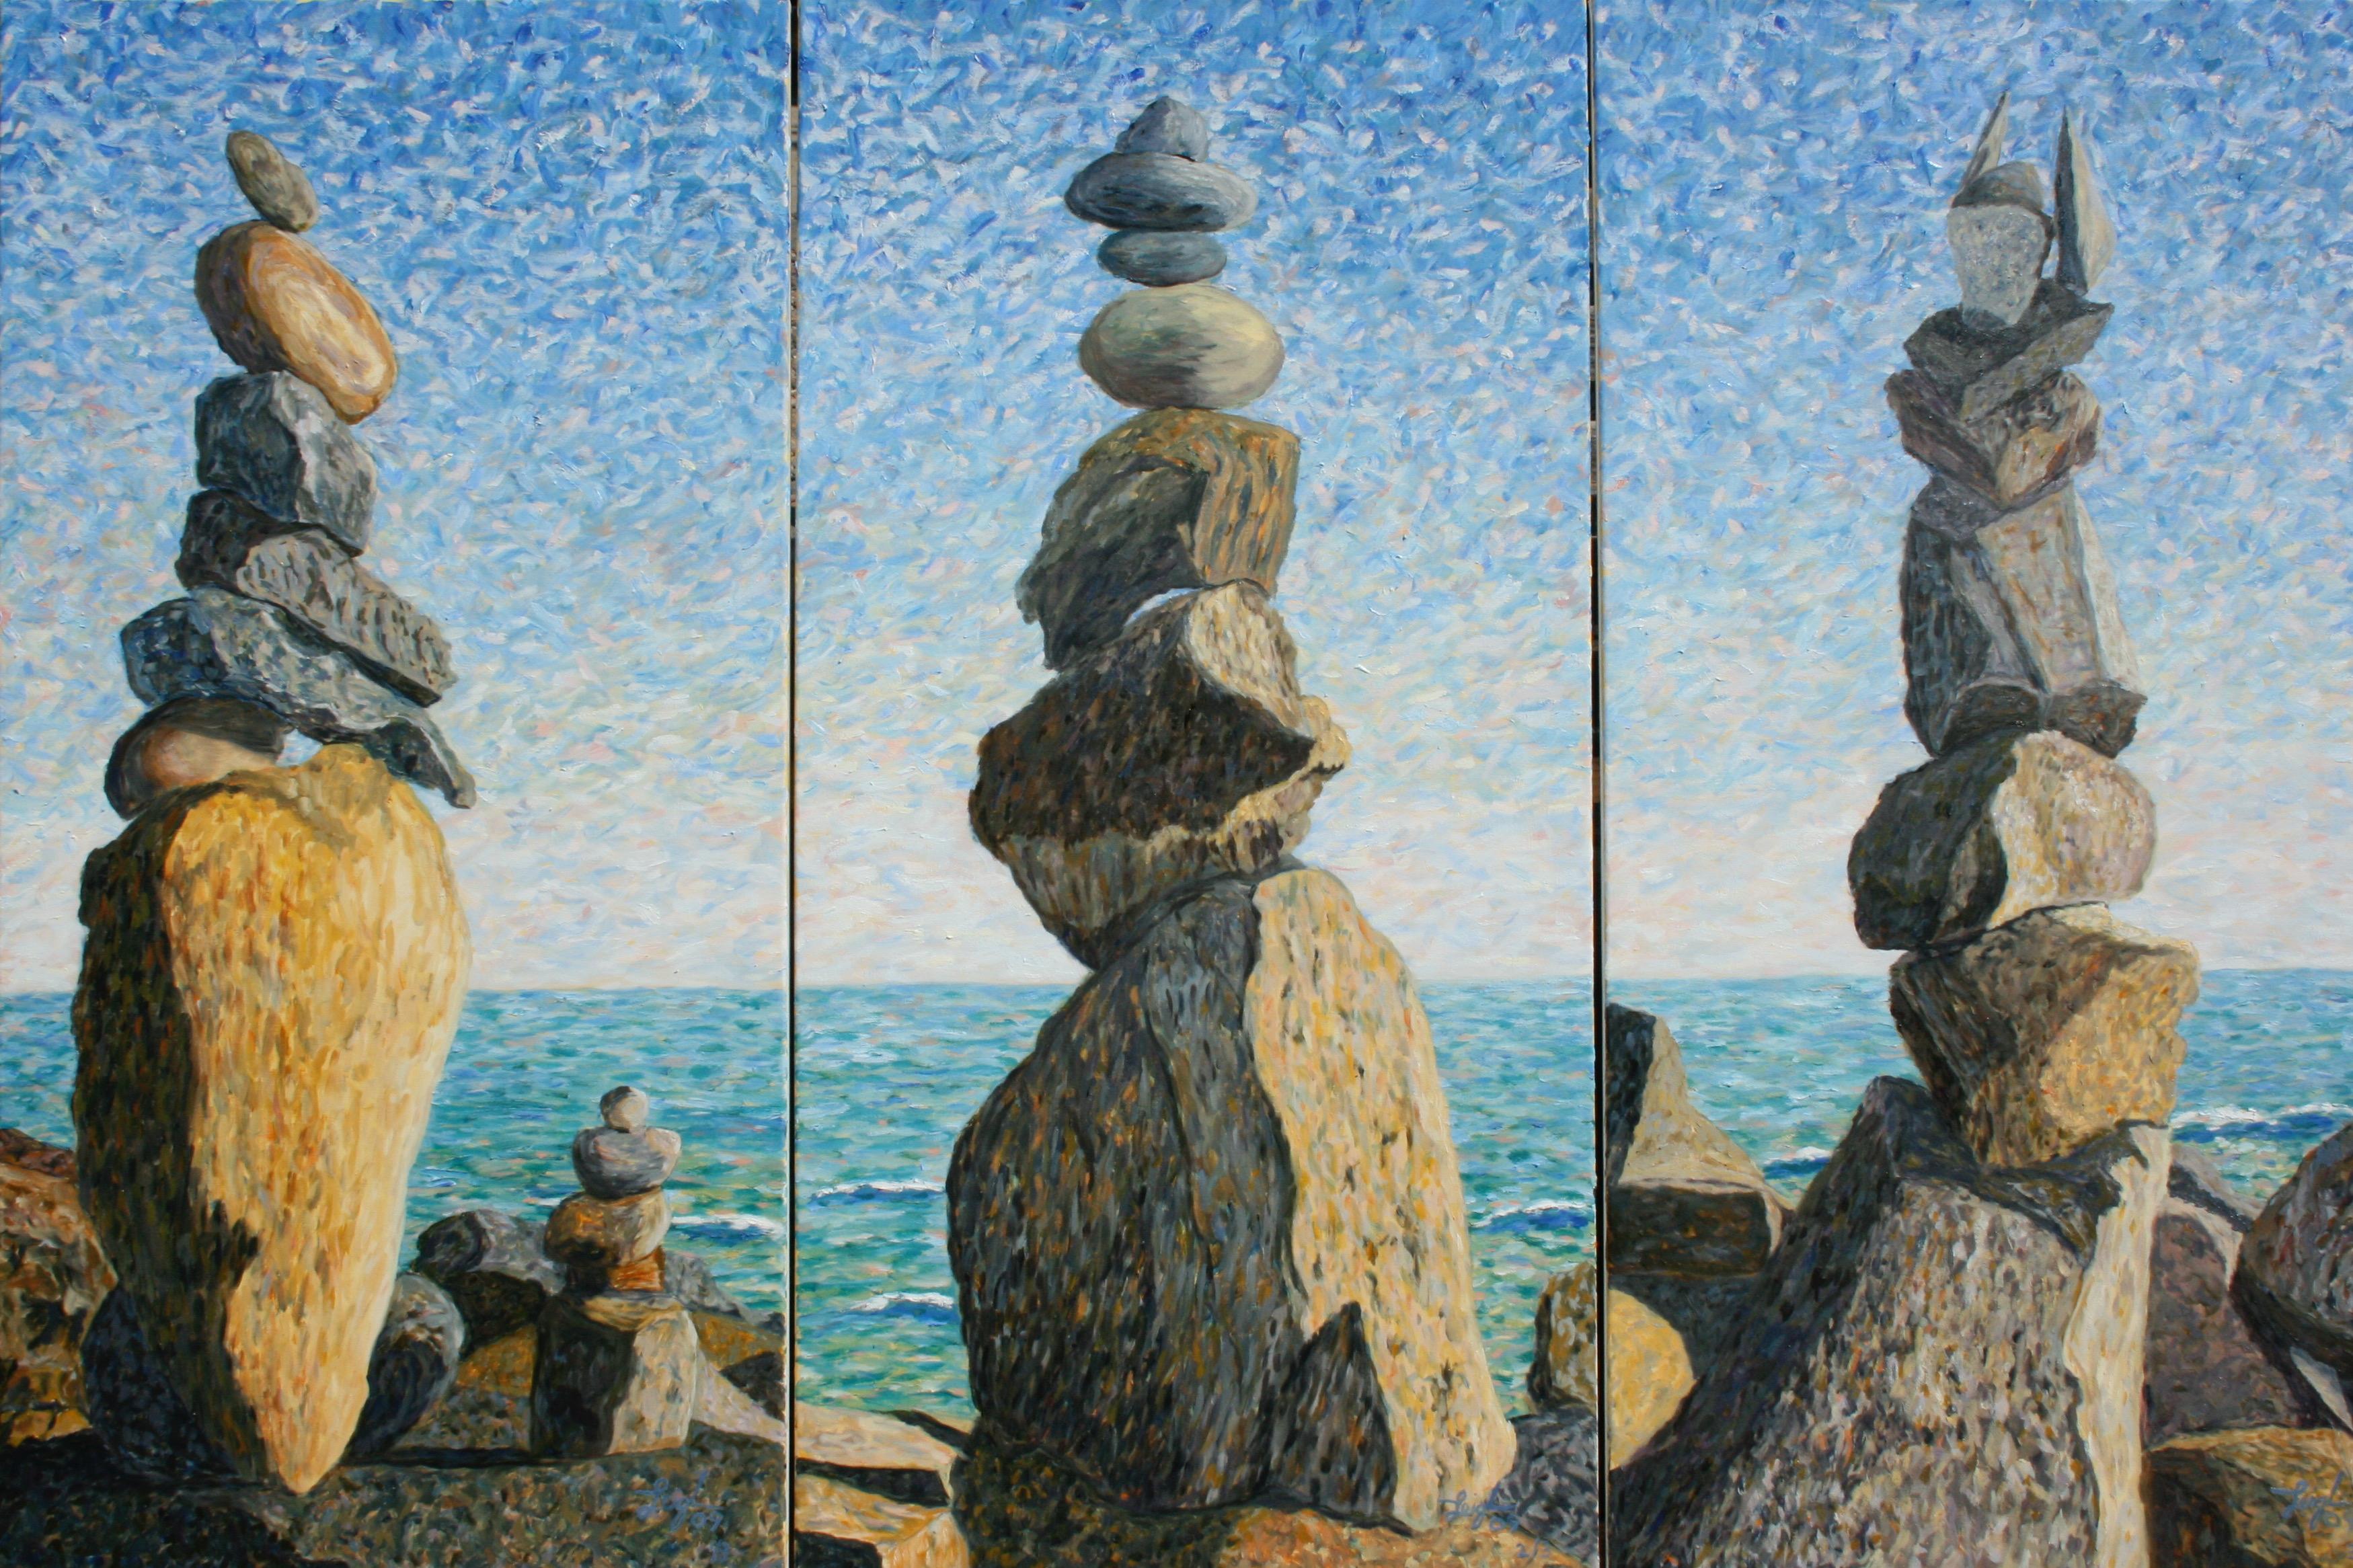 Impermanence: The Rock Sculptures ~  Carolyn Costin, Malibu, CA 2009 • 3 panels • 72 x 48